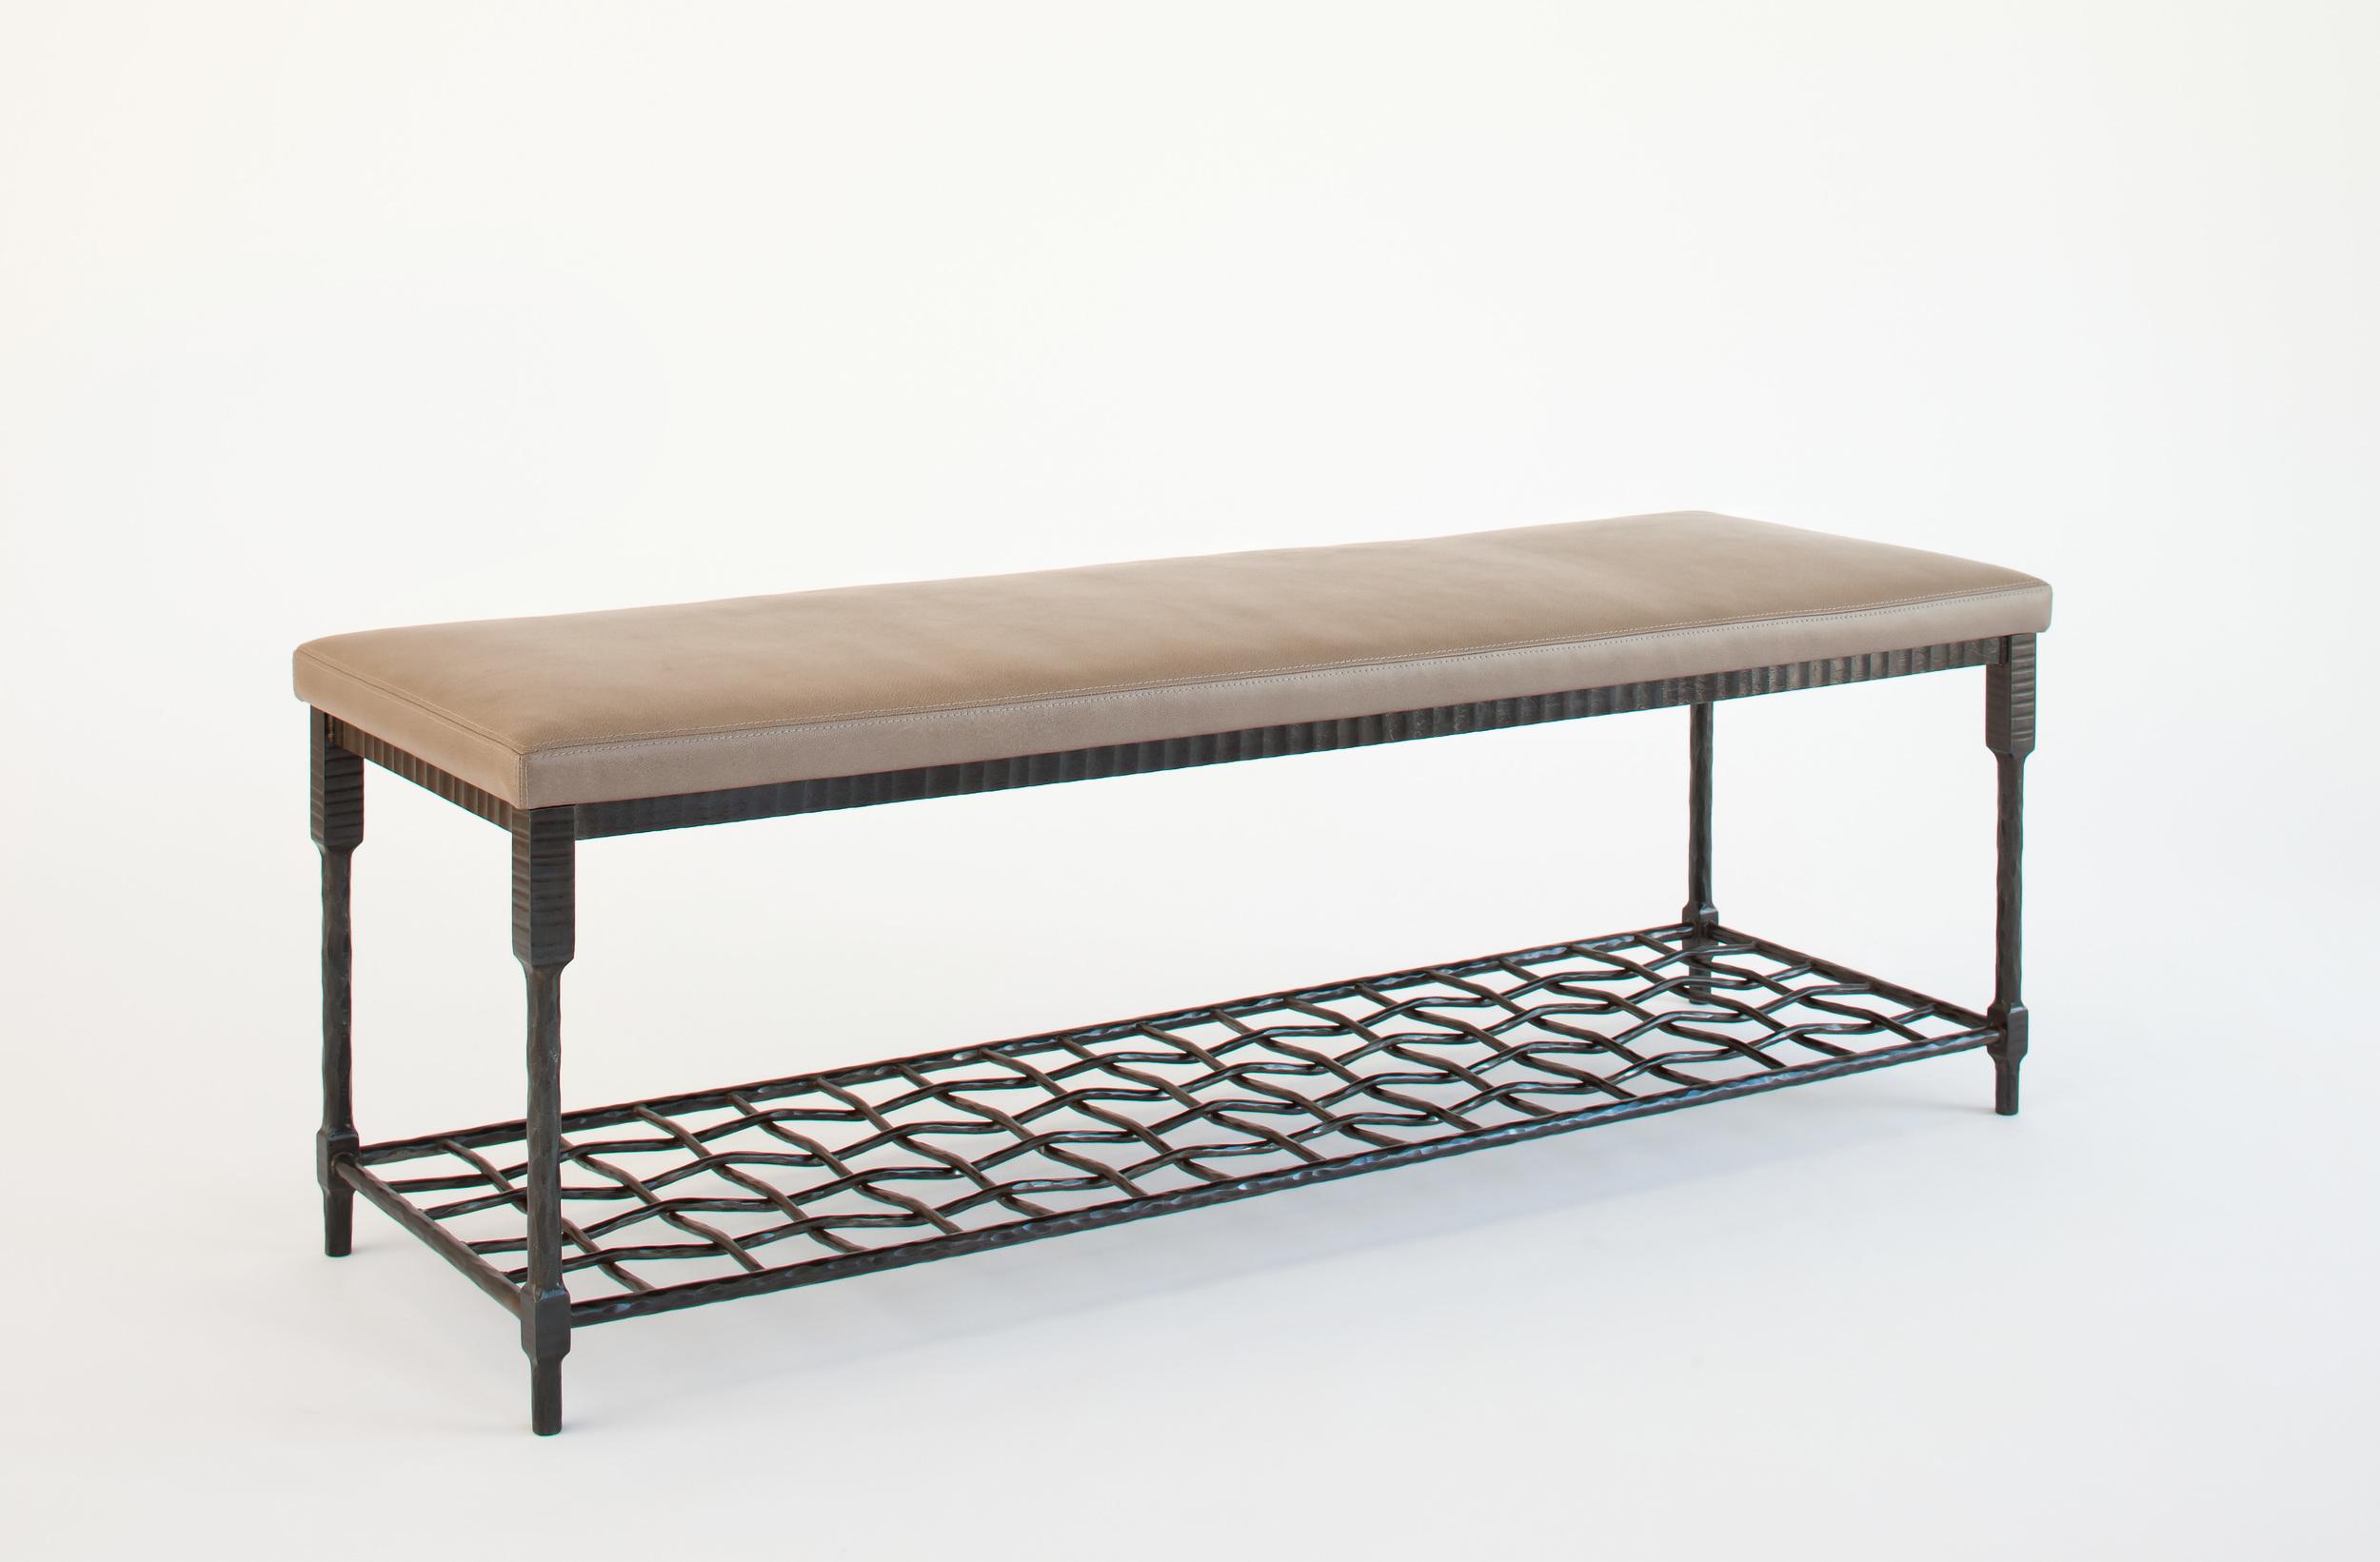 Custom Forged Leg Bench